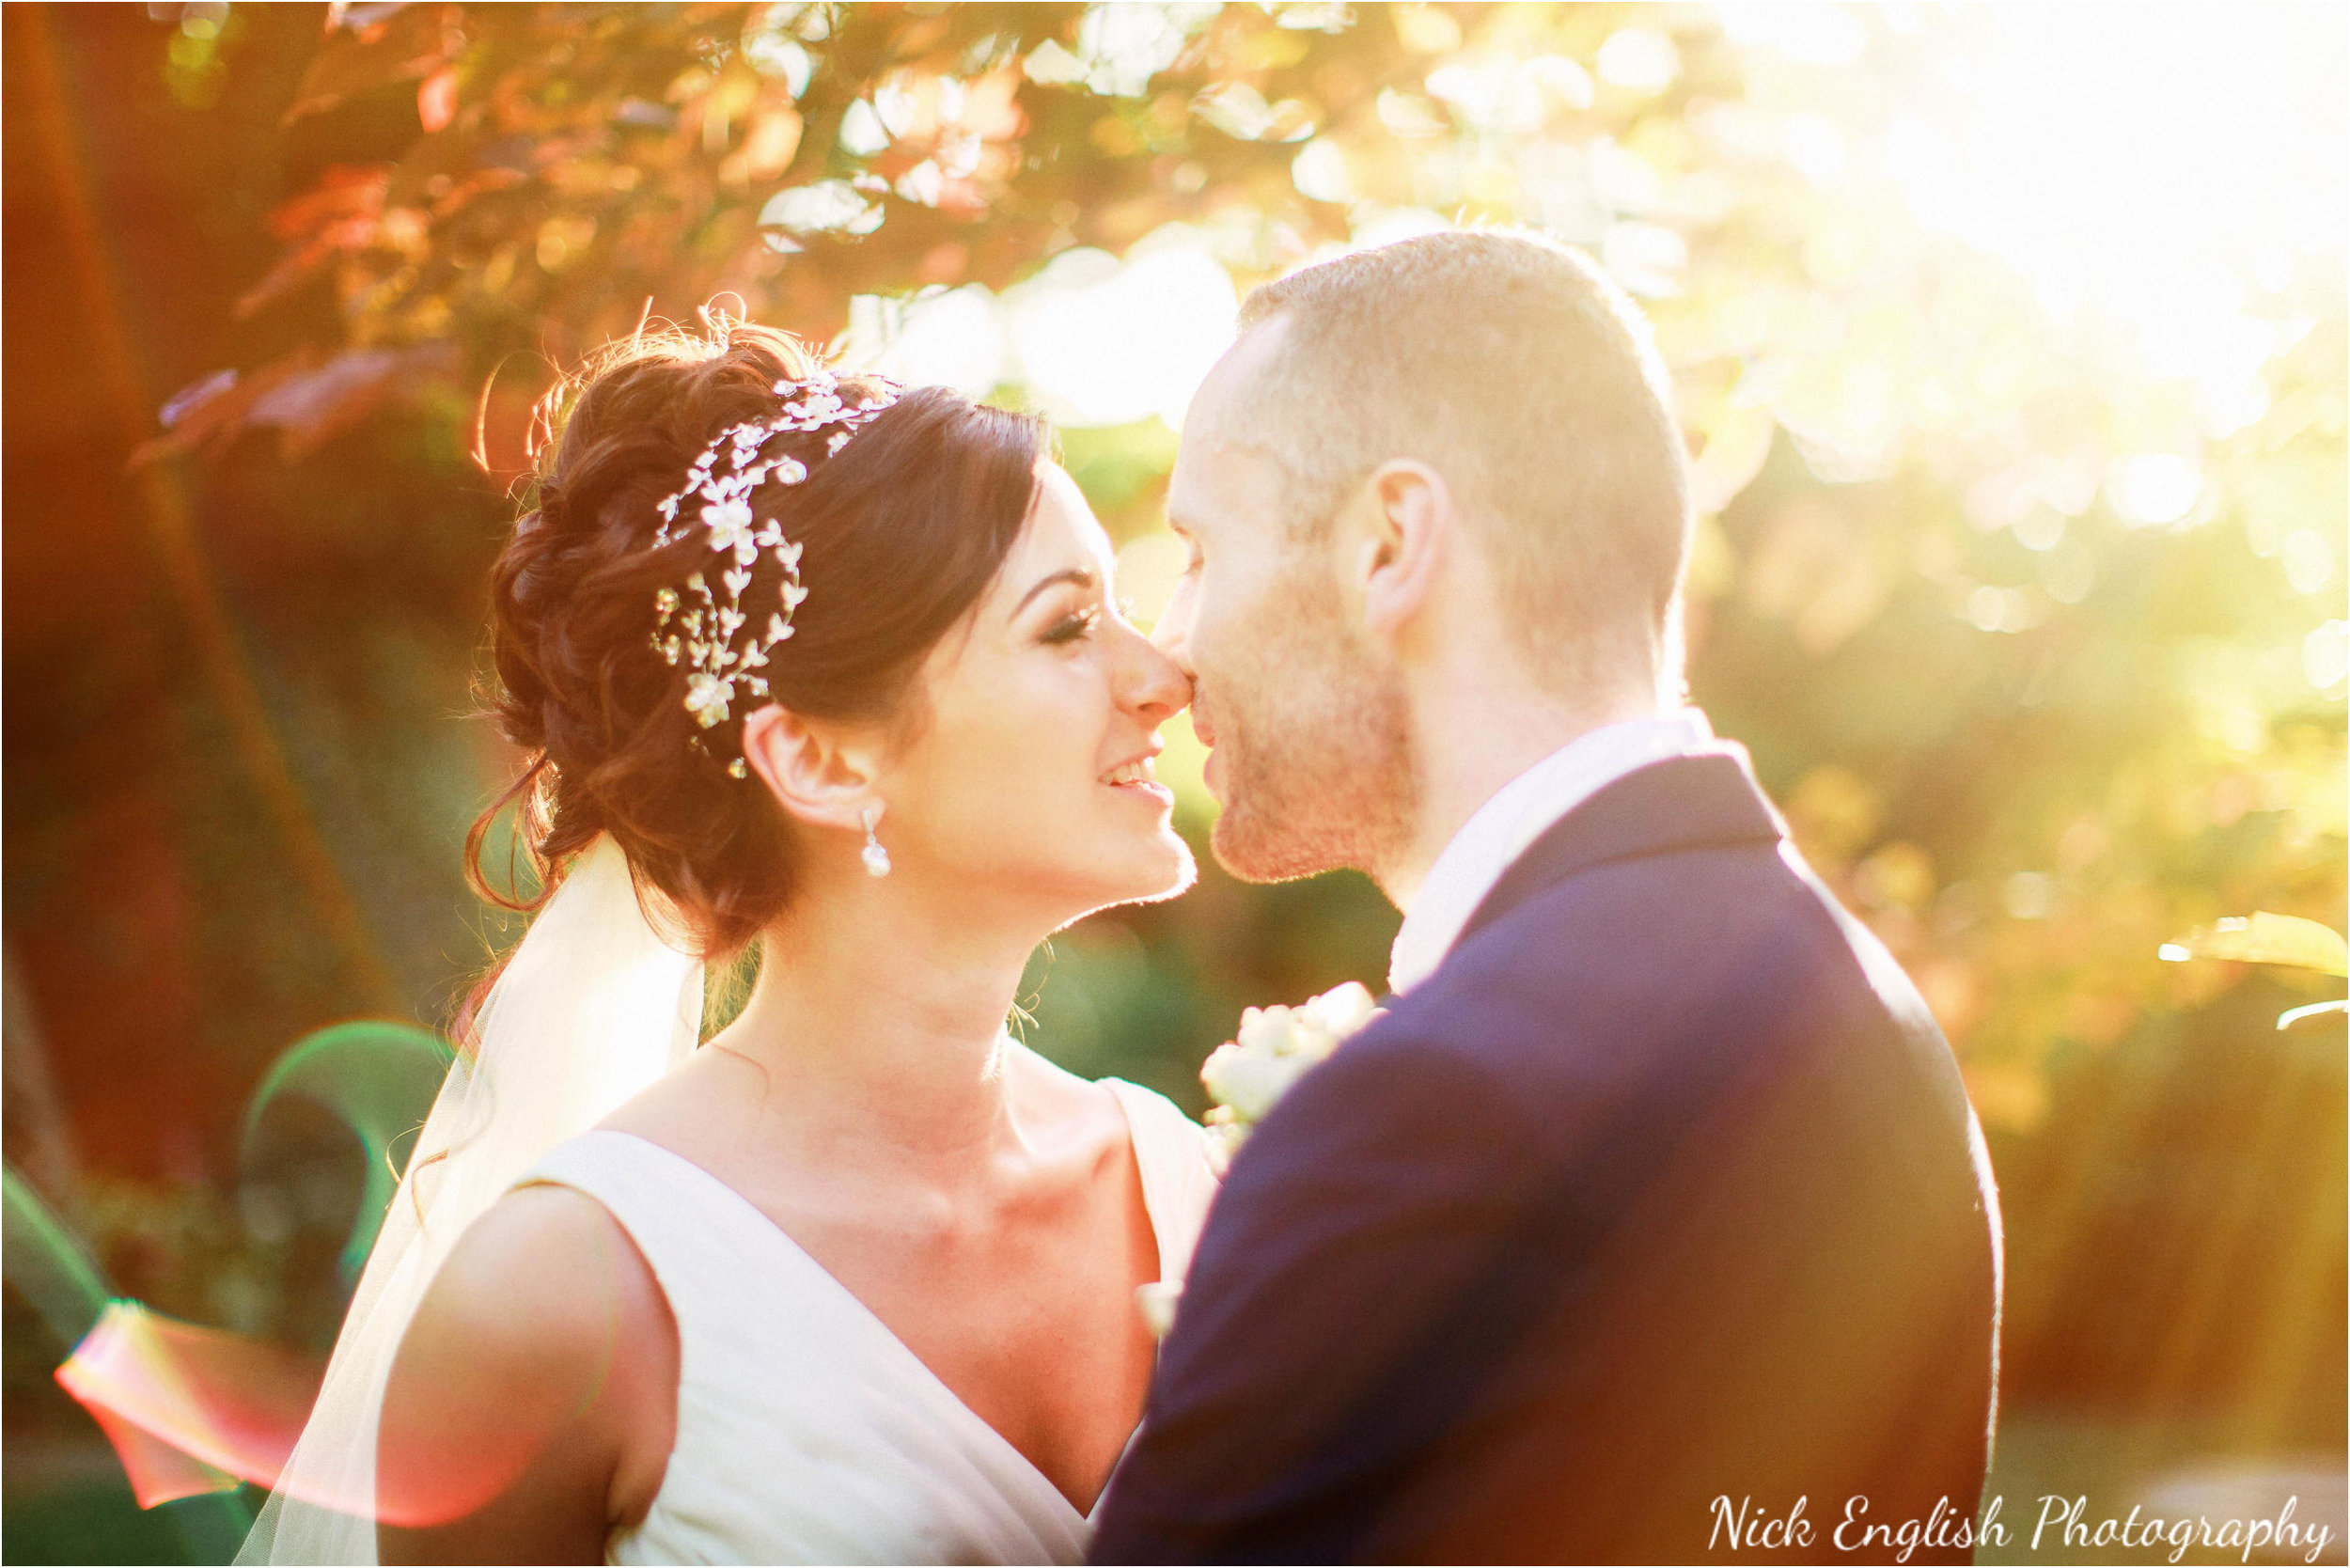 Emily David Wedding Photographs at Barton Grange Preston by Nick English Photography 197jpg.jpeg